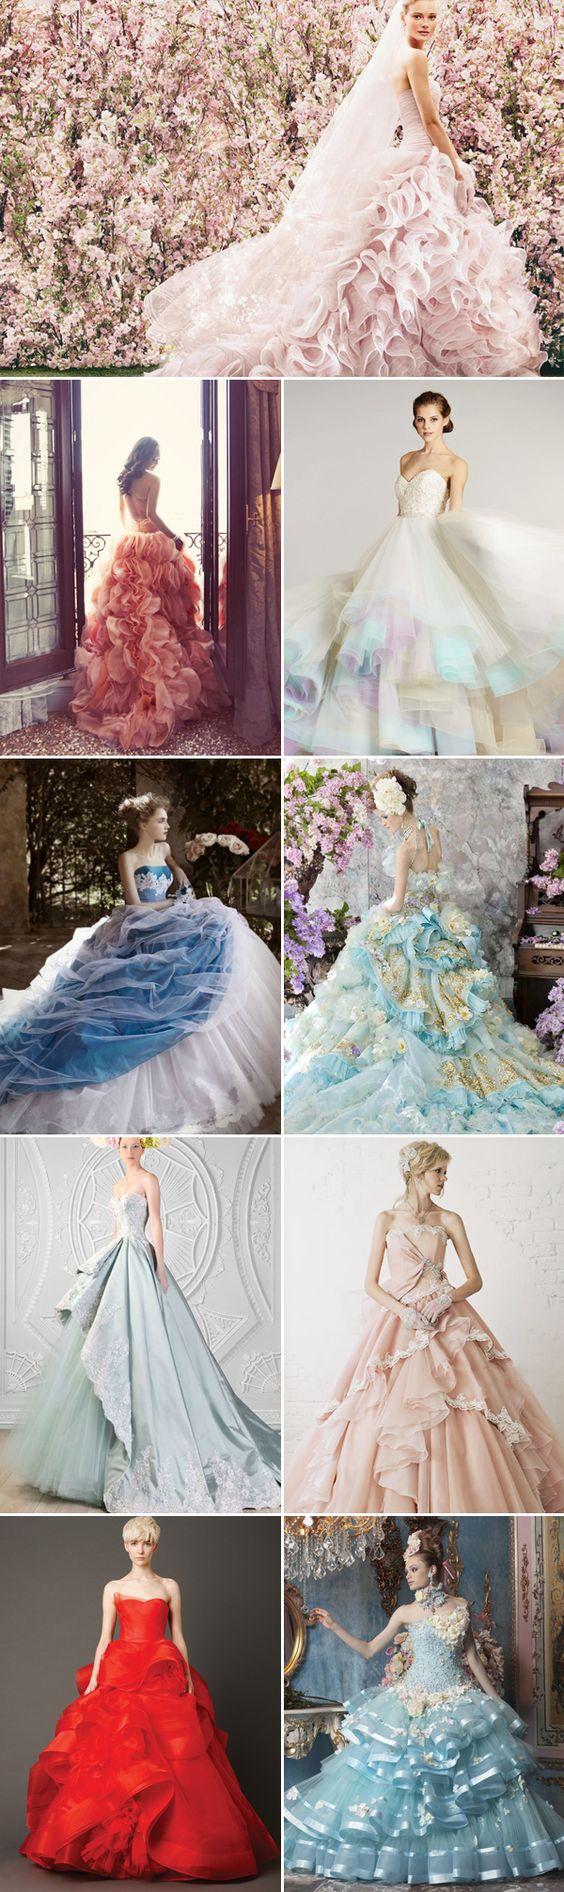 Vestidos de colores // Colored Gowns